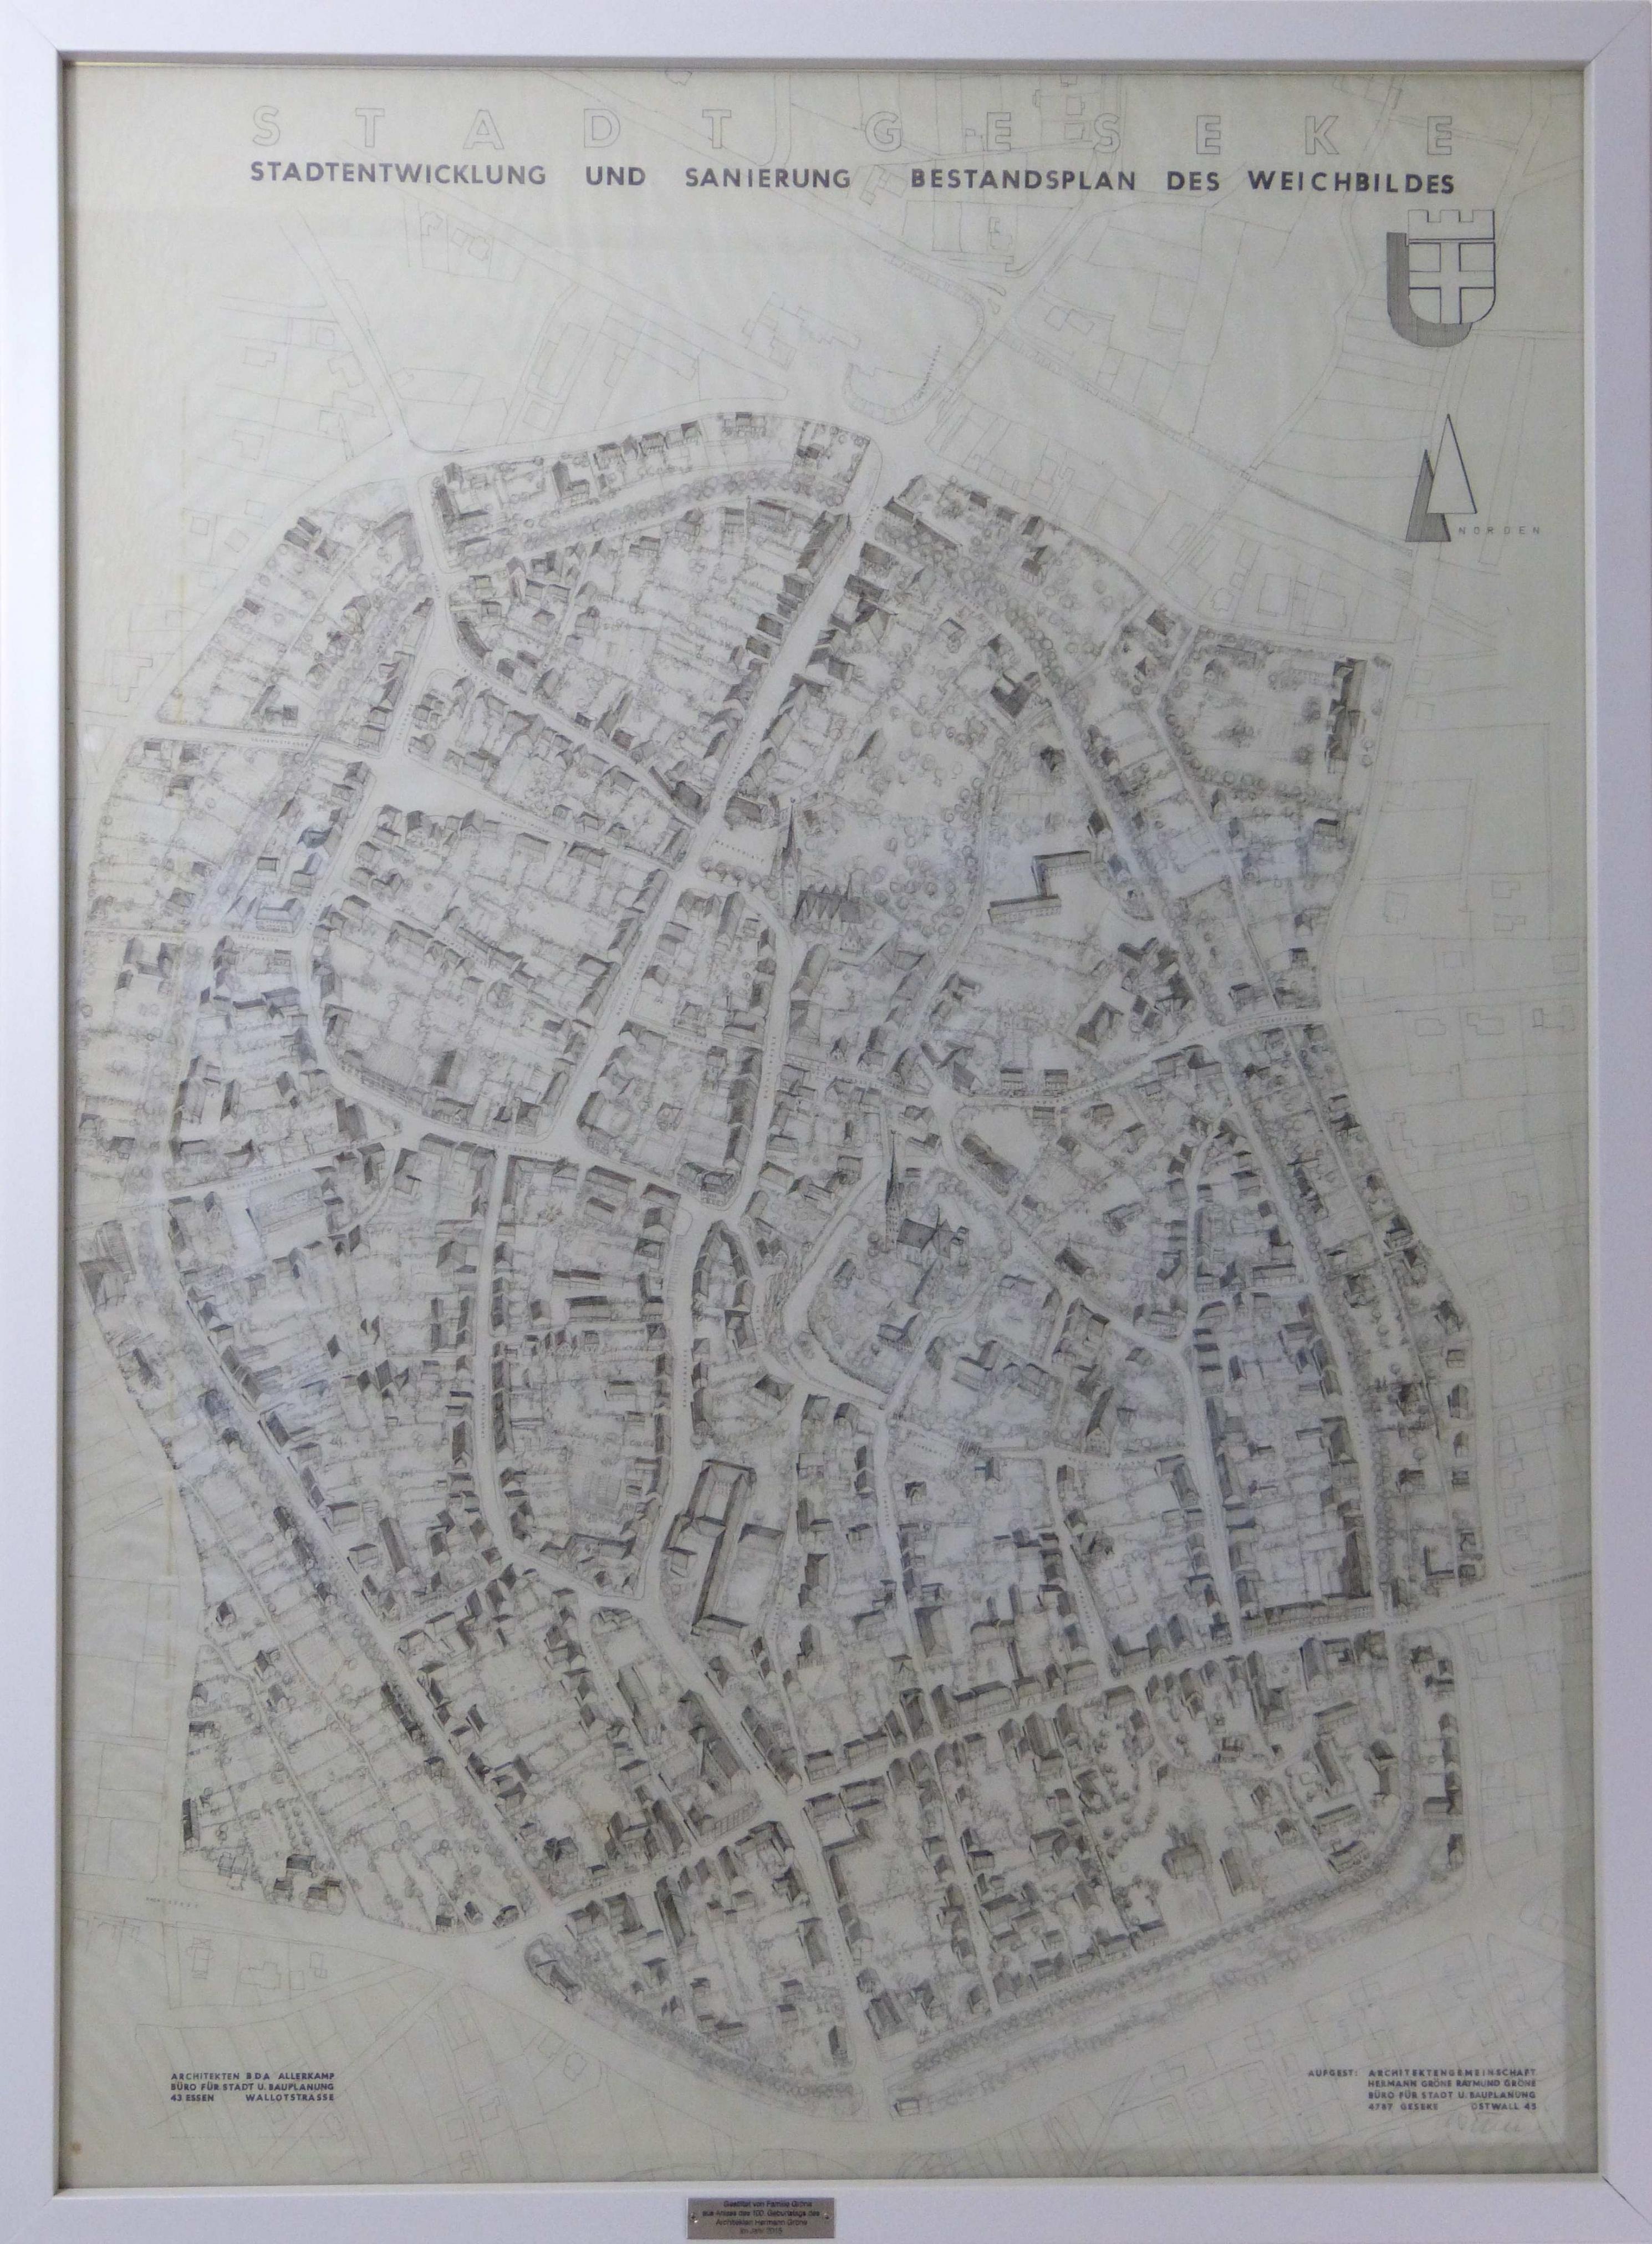 Ziemlich 94 Stadtplan Fotos - Elektrische Schaltplan-Ideen ...